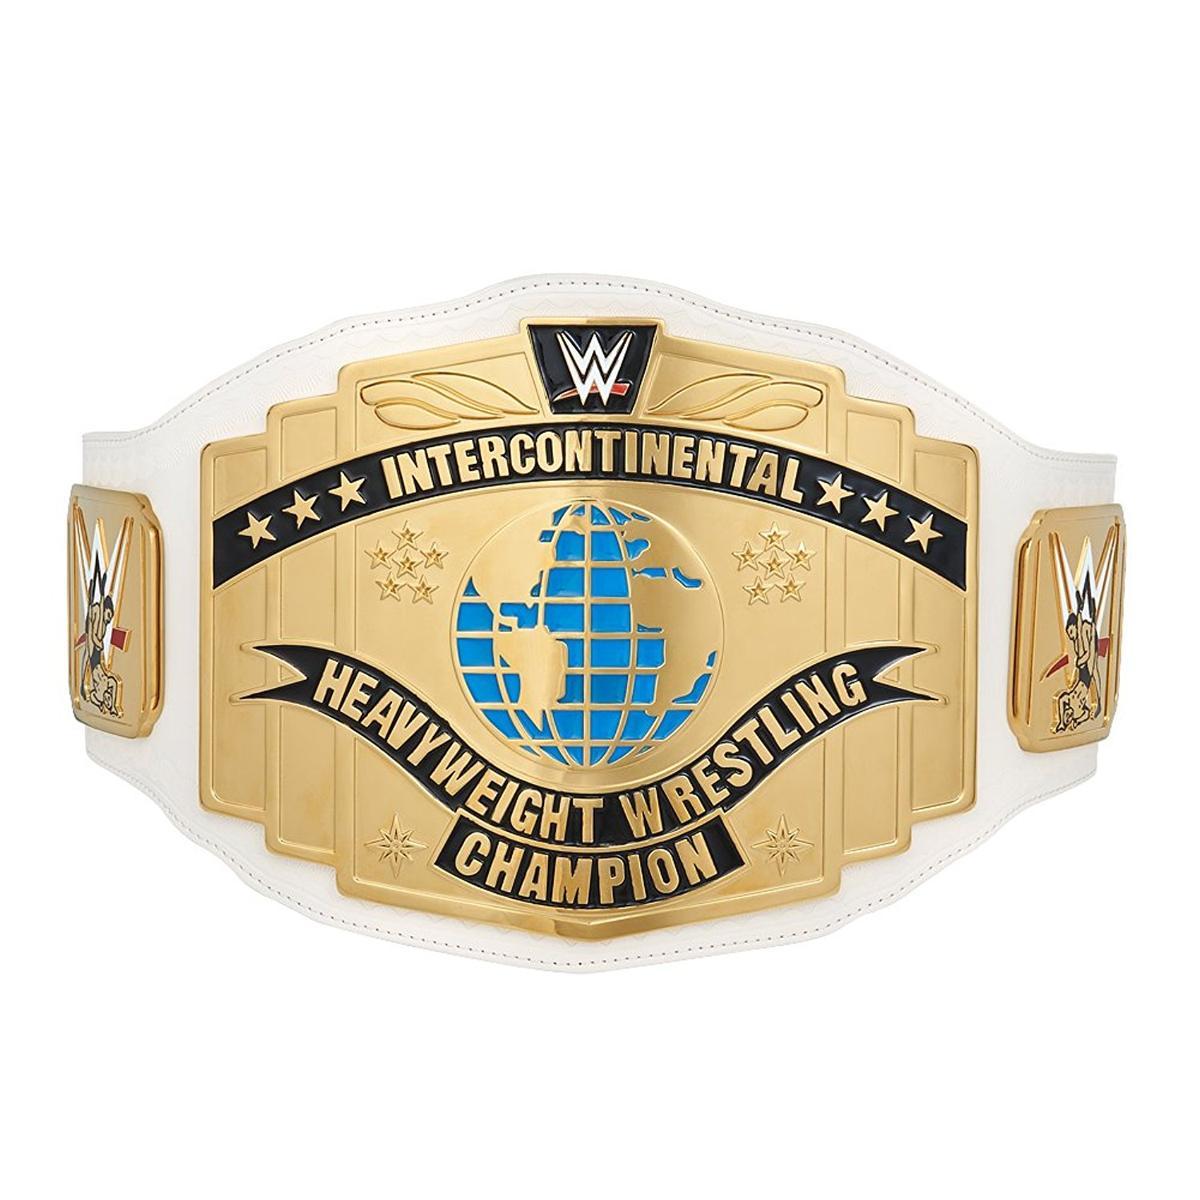 WWE インターコンチネンタル王座 チャンピオンベルト レプリカ 白 2014 アメリカ プロレス グッズ